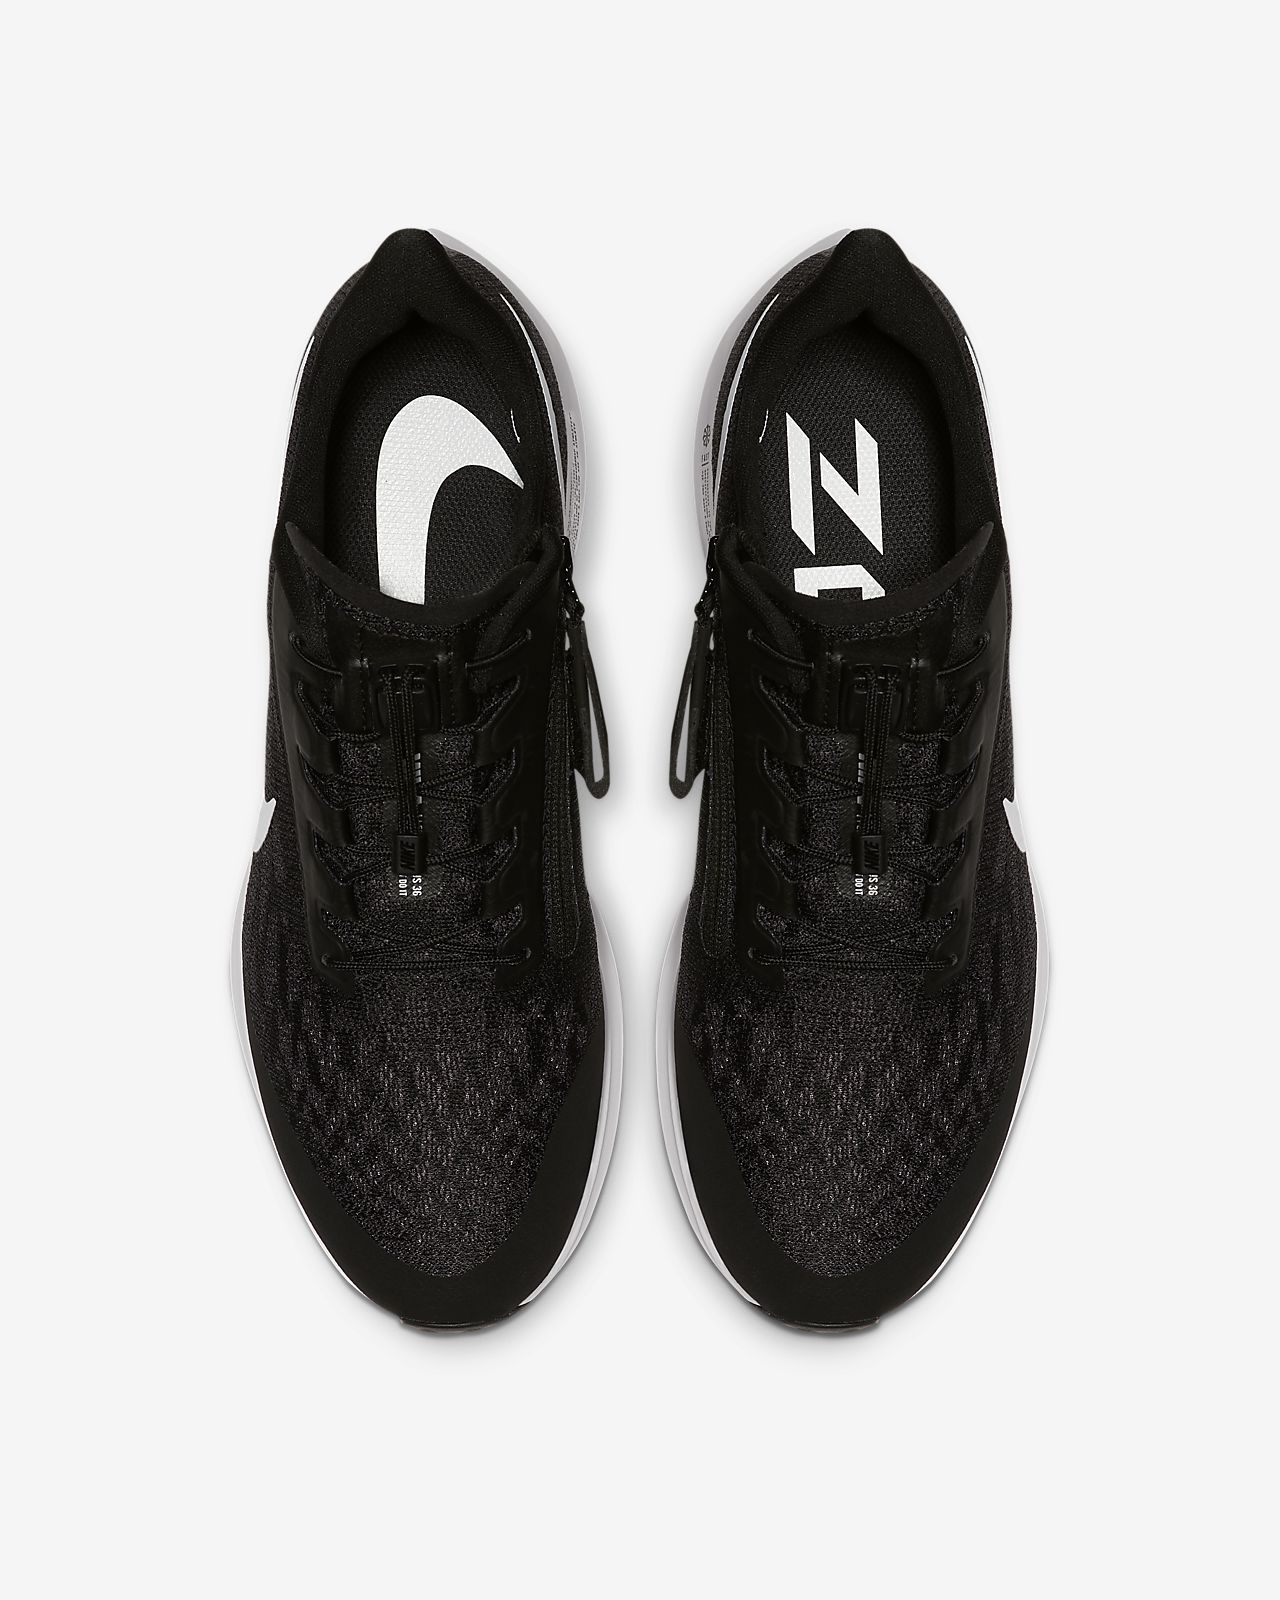 Nike Flyease Zoom De Air Pegasus Pour Running Chaussure